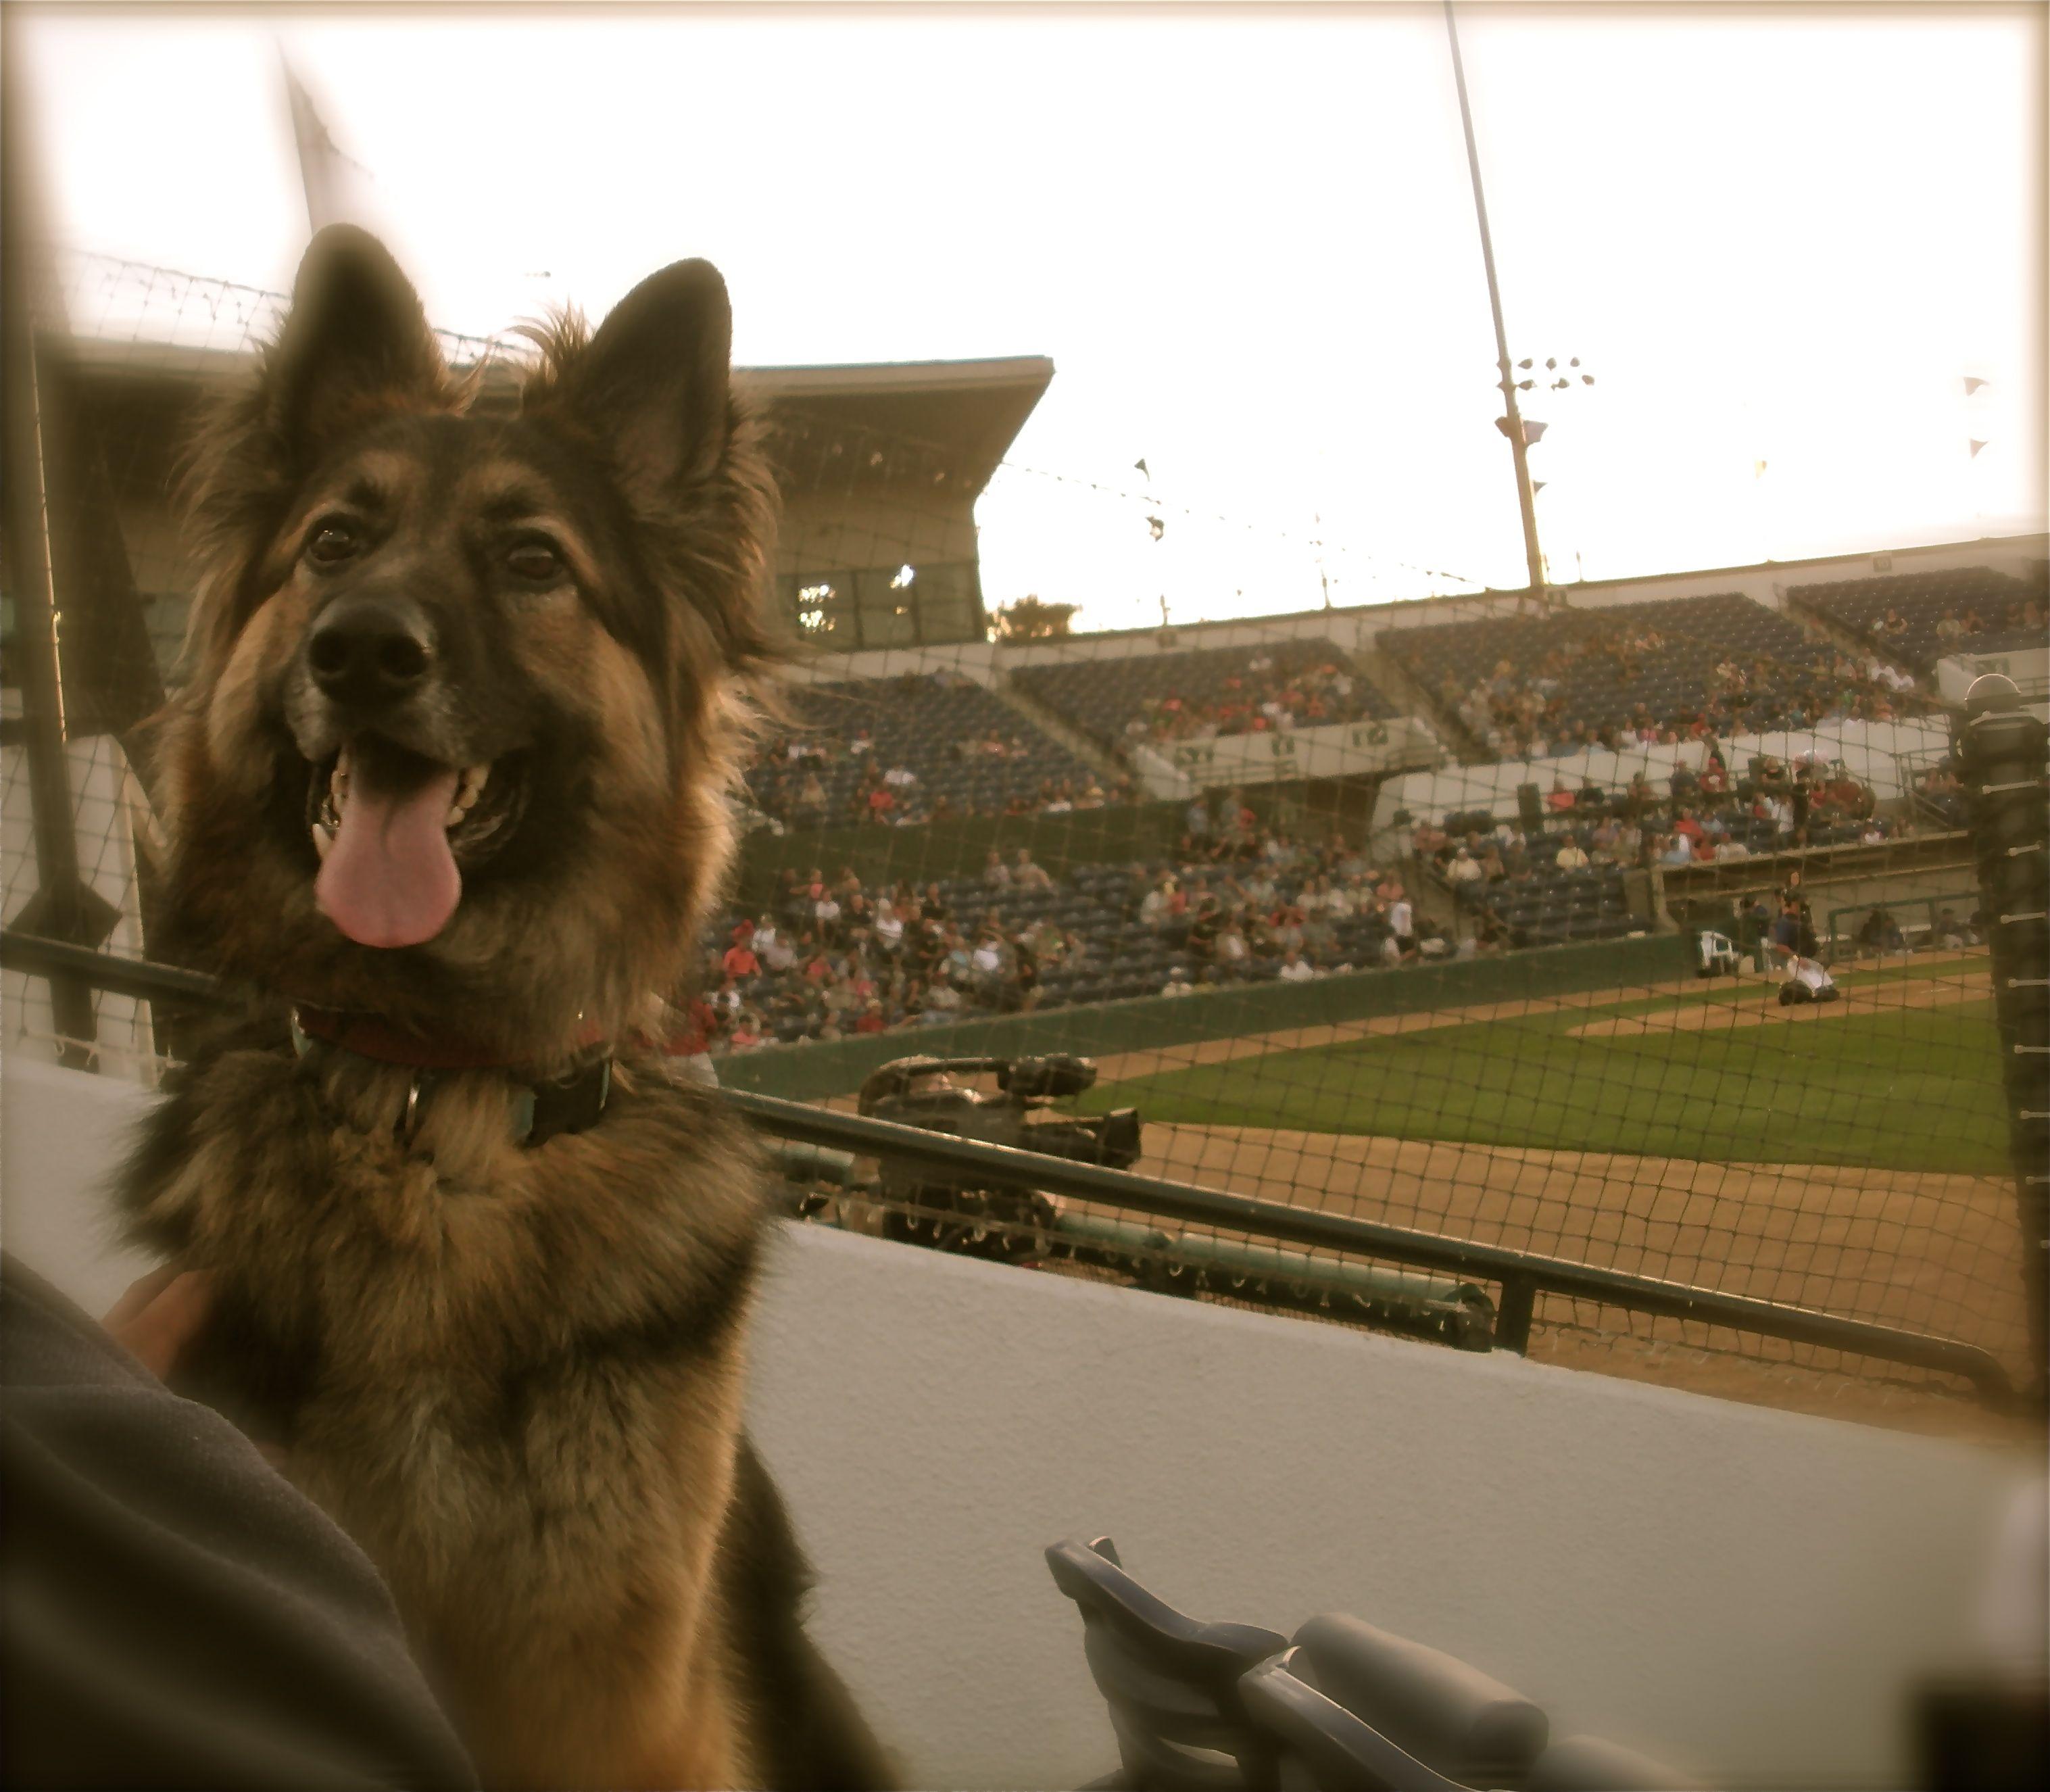 My dog Denver, he loves going to Bark in the Park. He